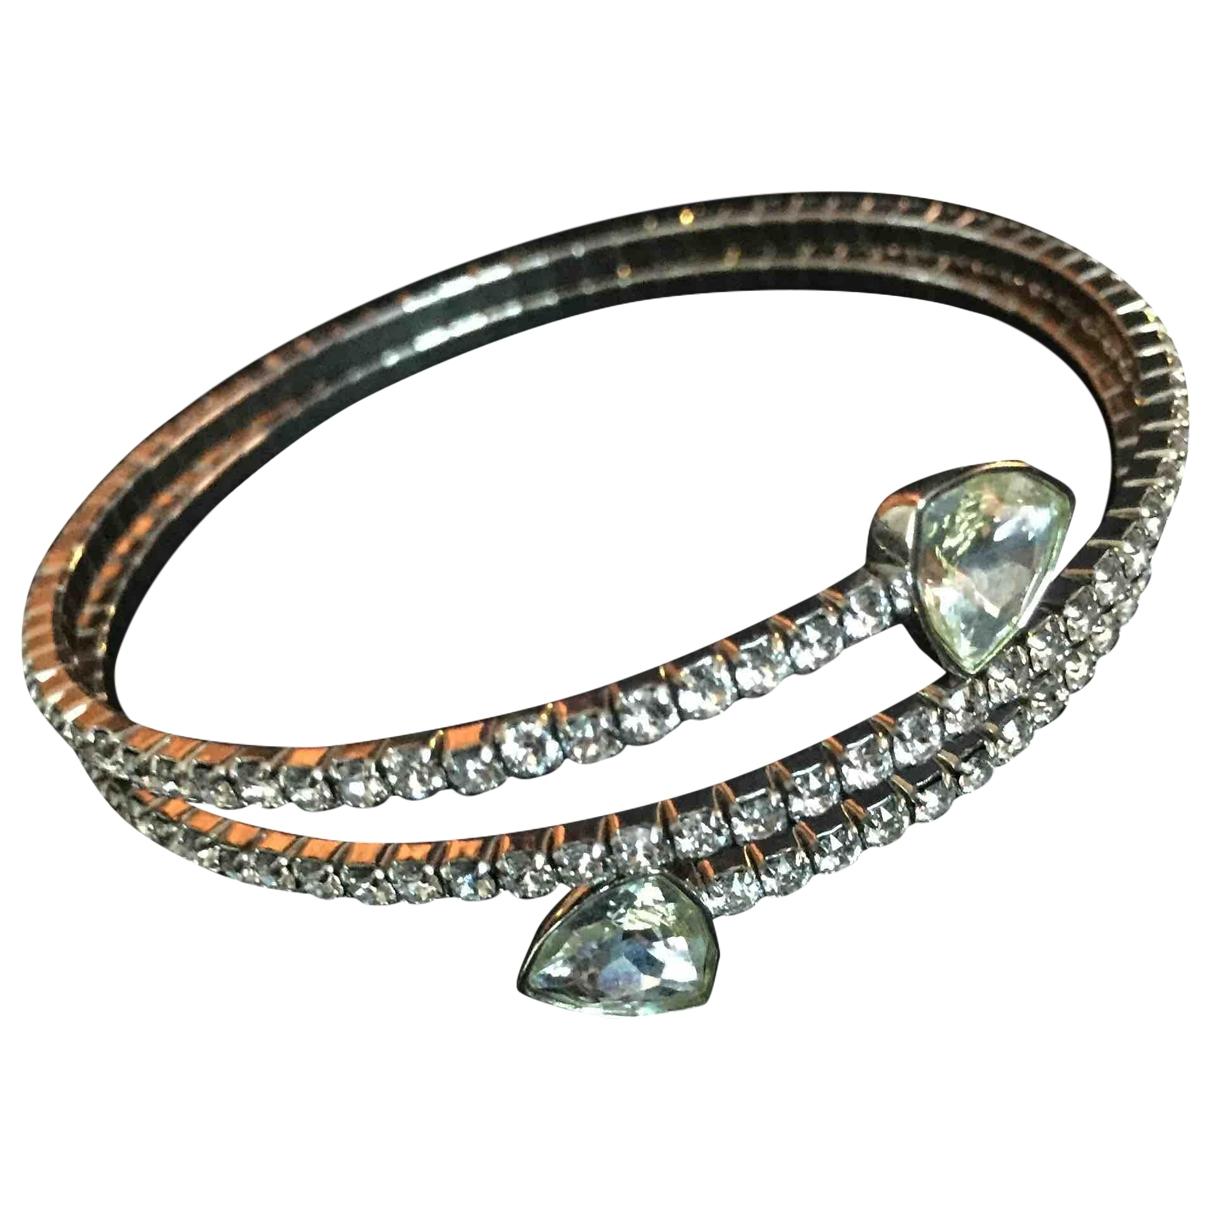 Swarovski Slake Armband in  Silber Metall